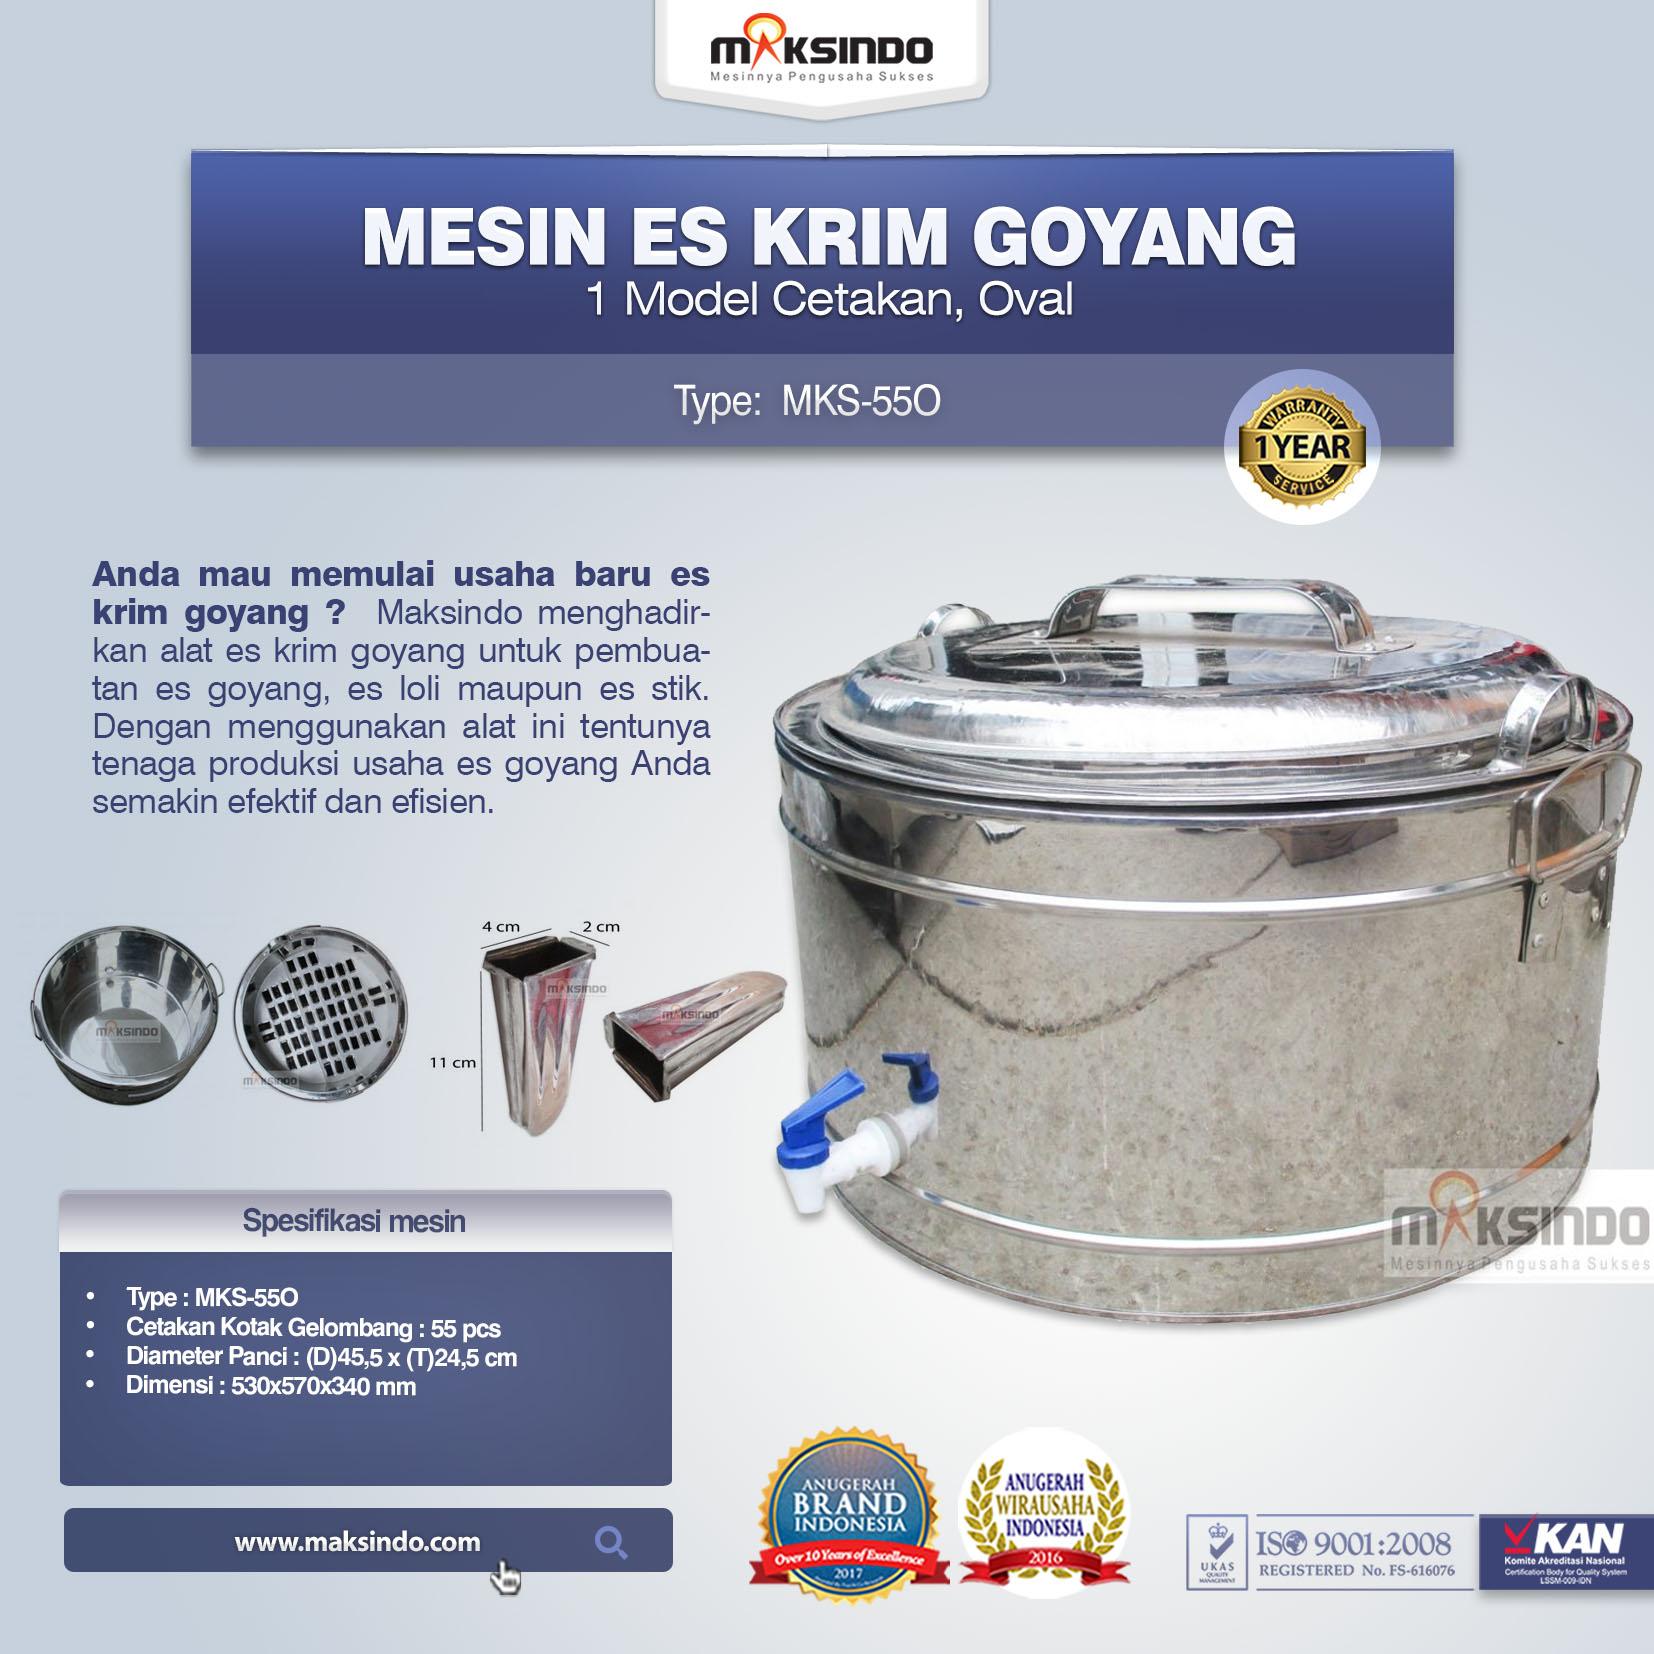 Alat Es Krim Goyang MKS-55O